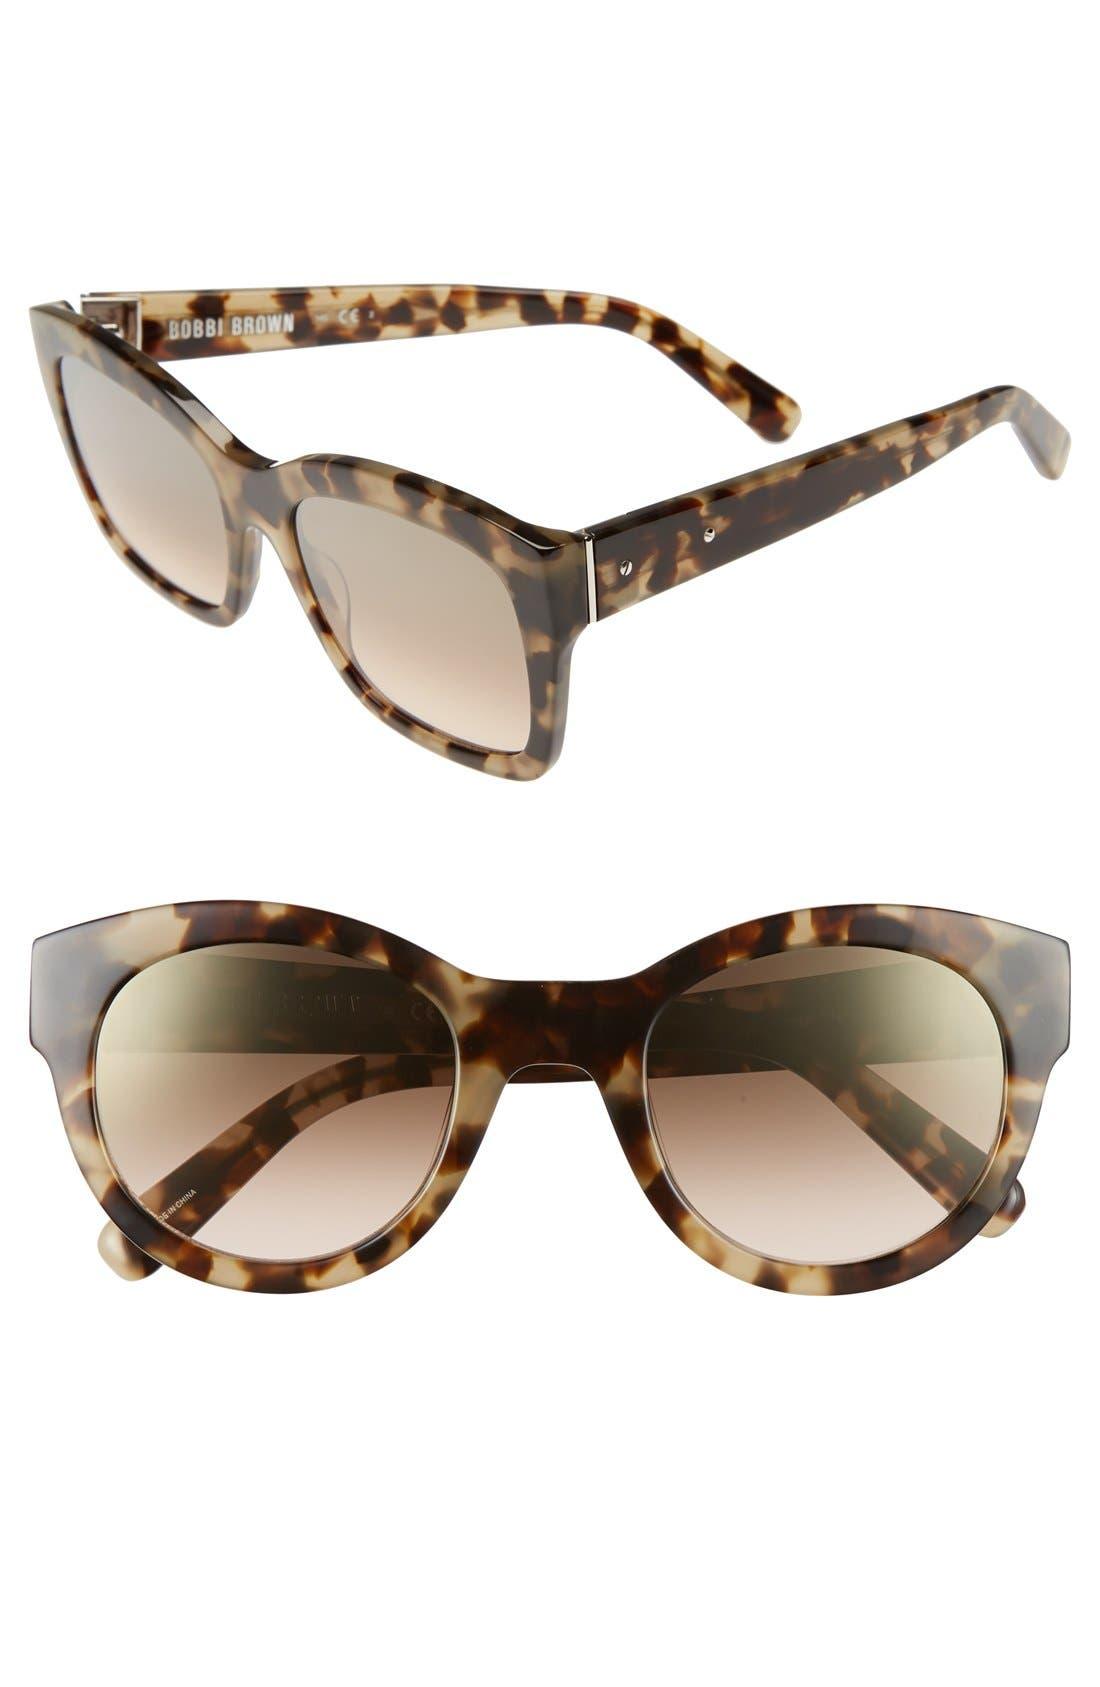 Main Image - Bobbi Brown 'Ava' 54mm Sunglasses